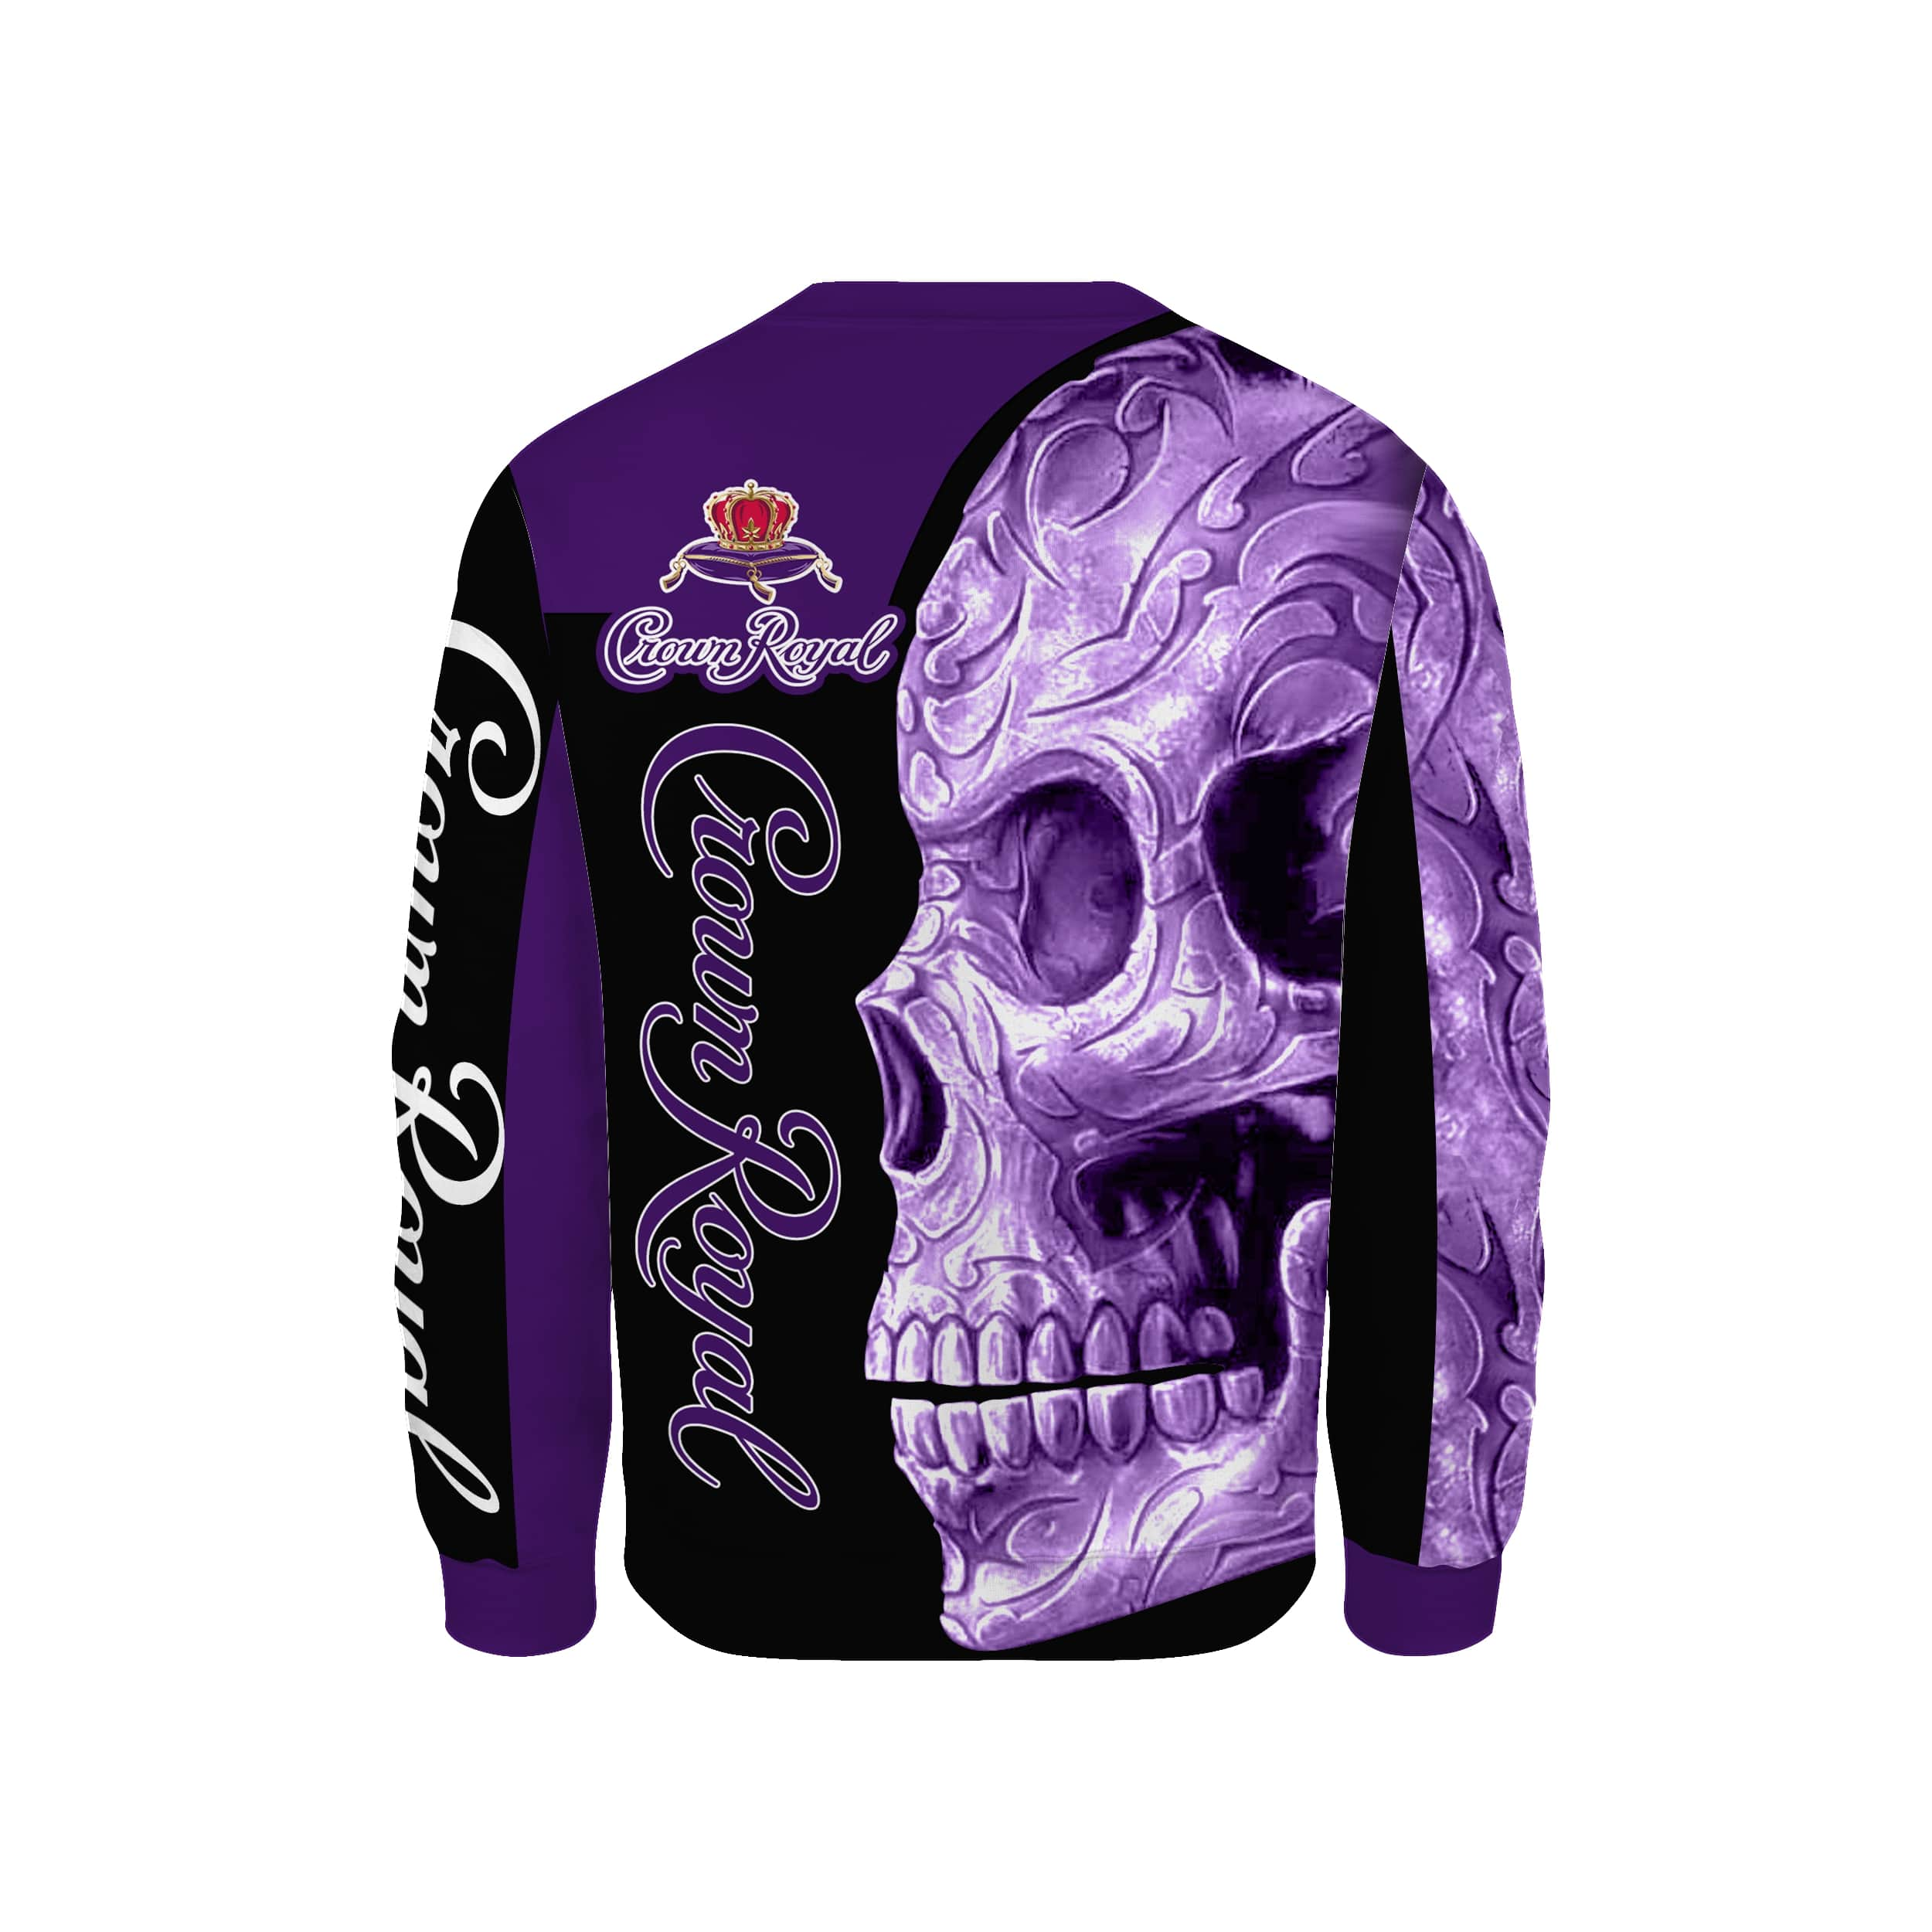 Skull Crown Royal all over print sweatshirt 1